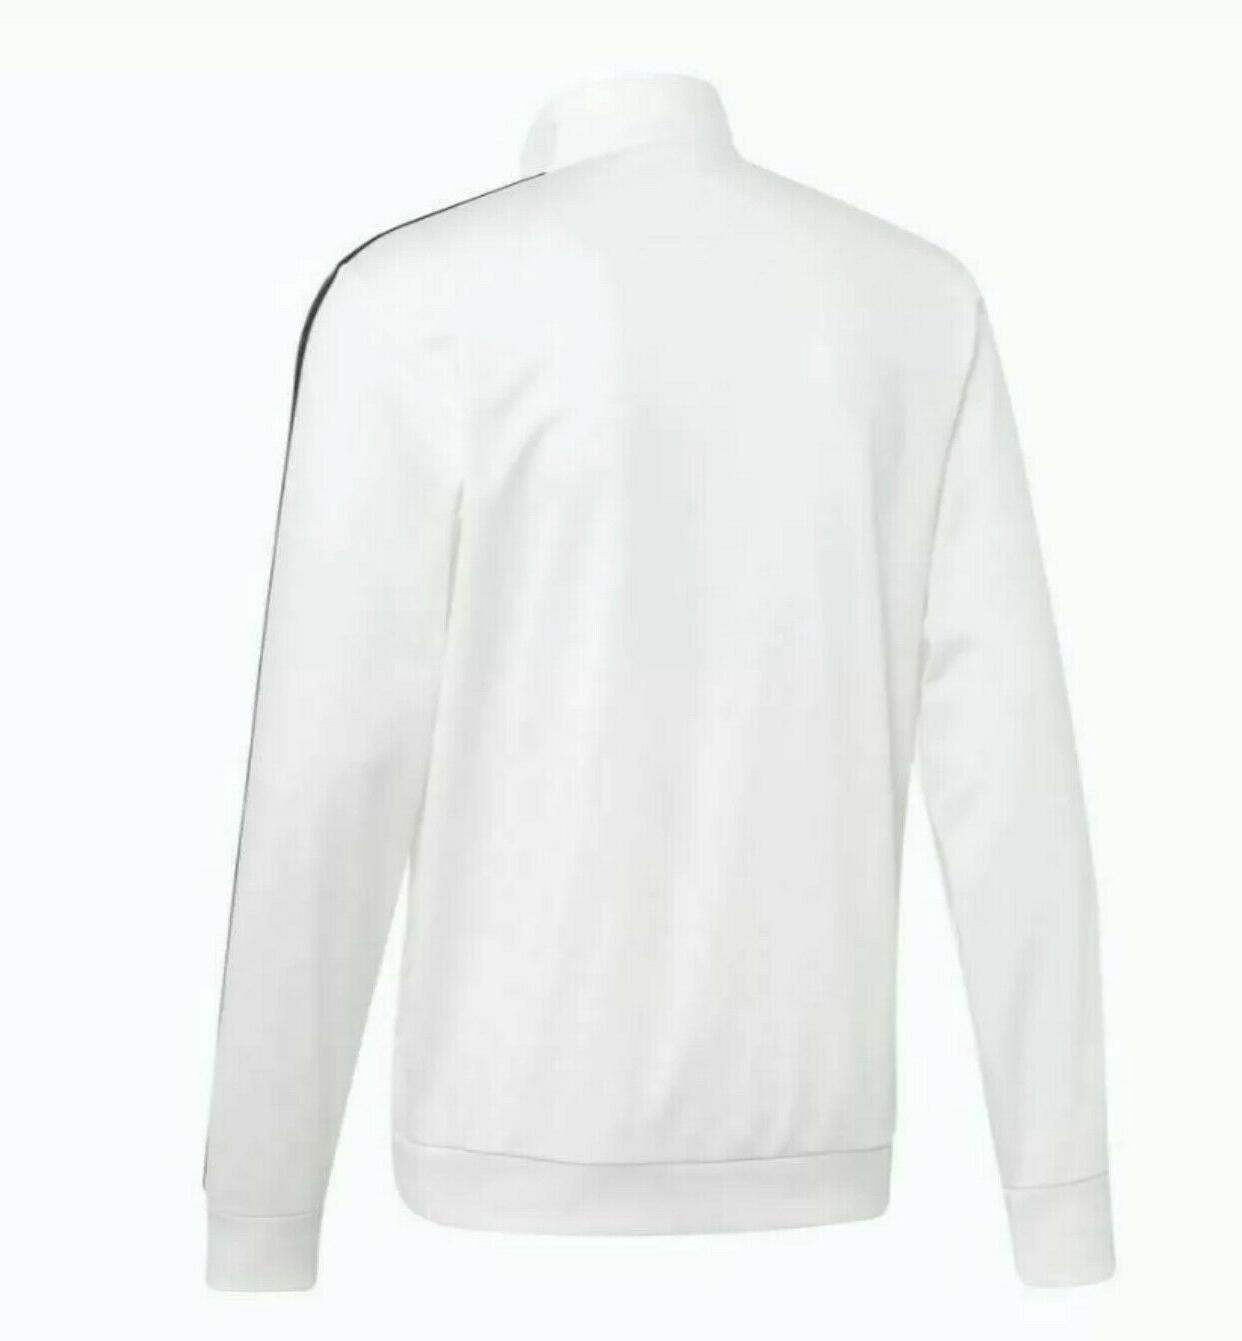 NWT Tricot Track Jacket,